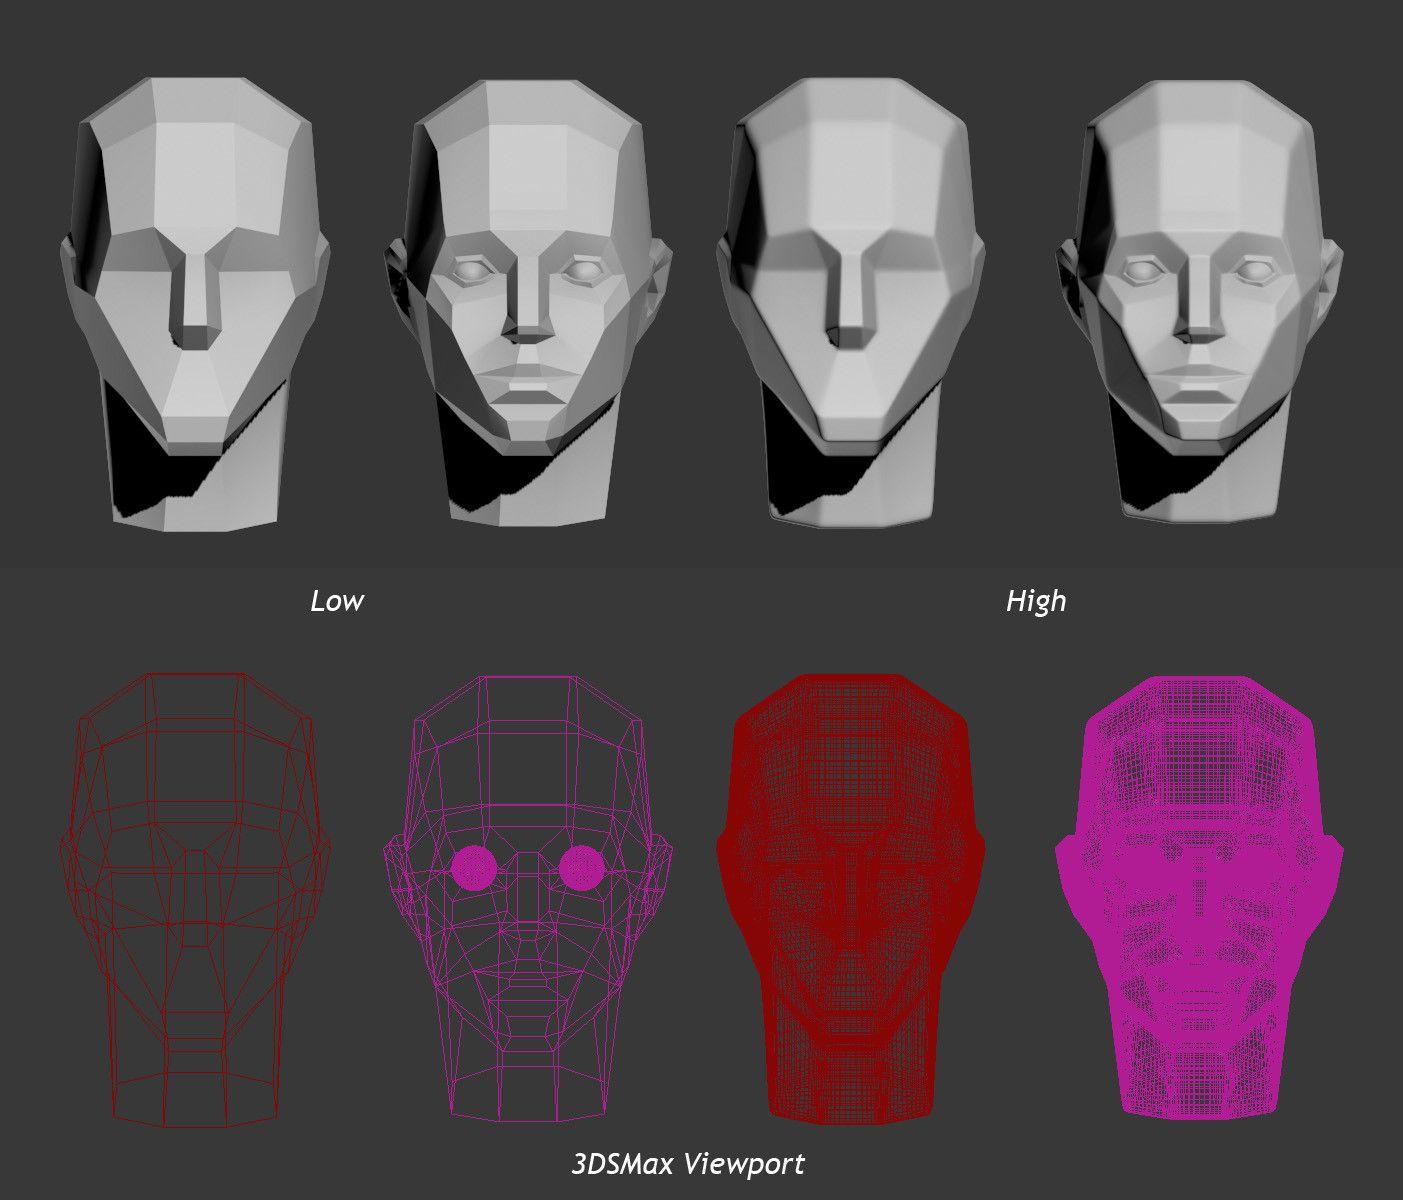 3d model planes head anatomy | Study | Pinterest | Head anatomy ...